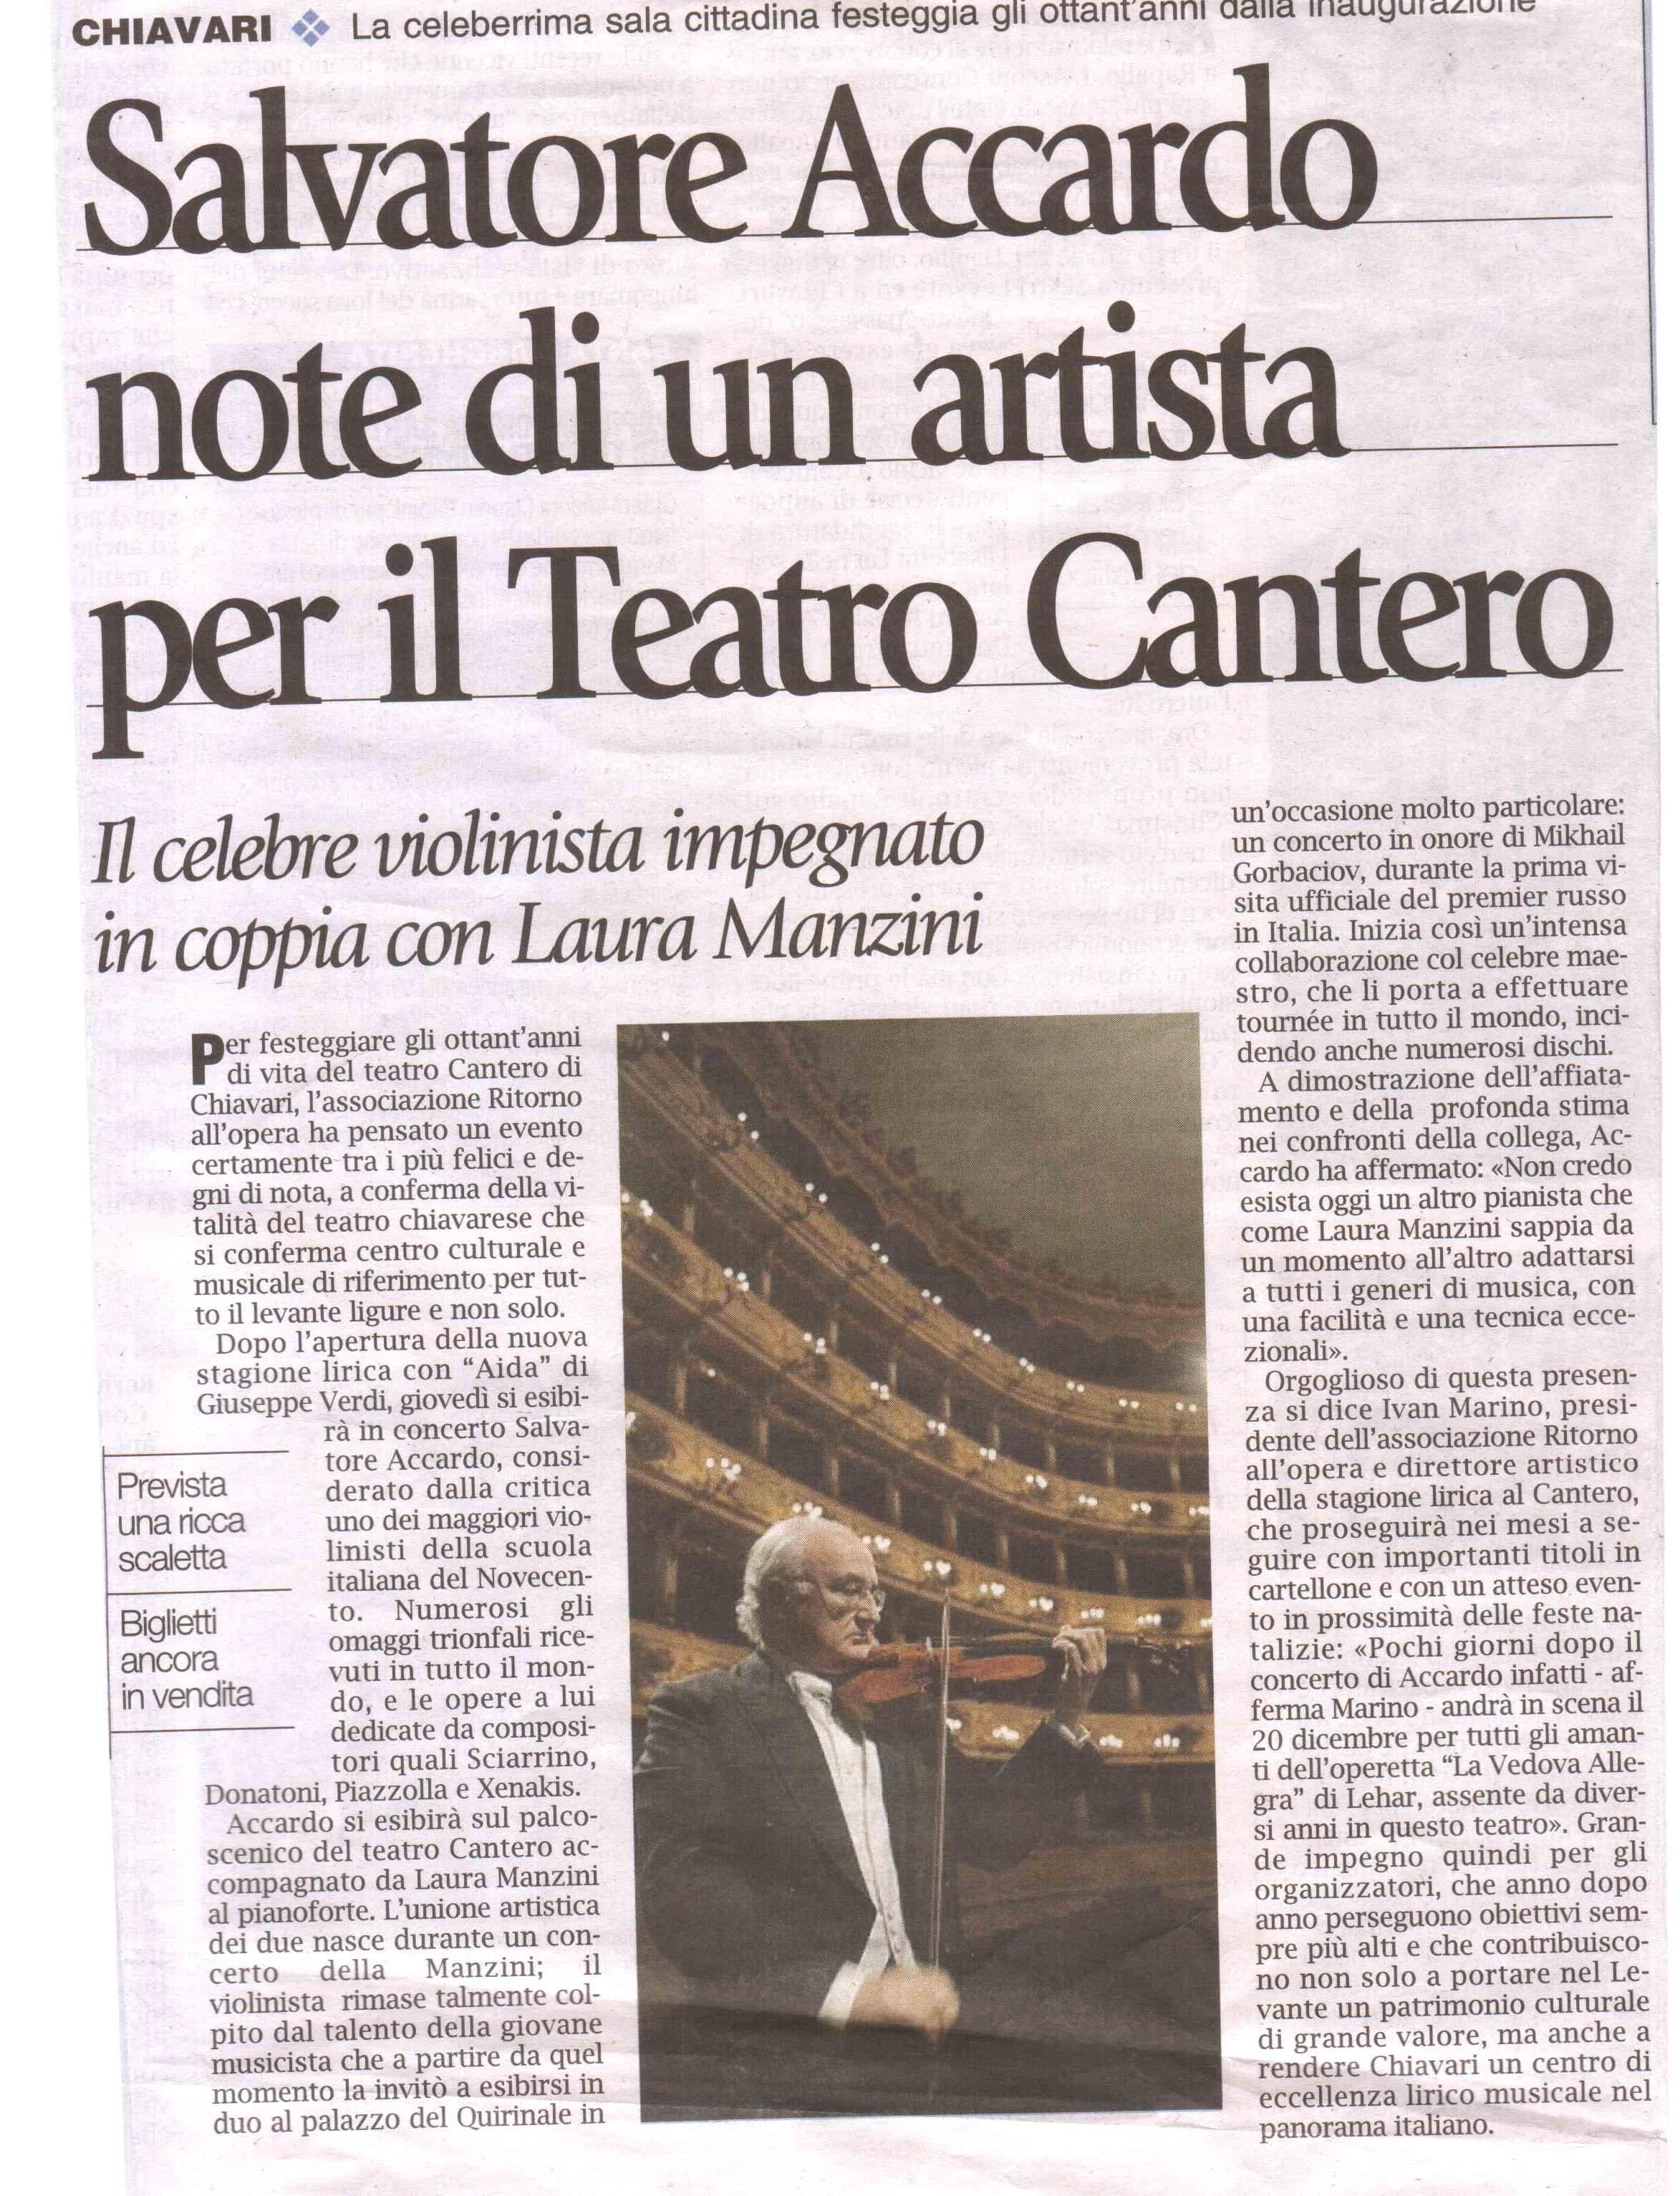 11.12.2011 – CORRIERE MERCANTILE – Salvatore Accardo in Concerto